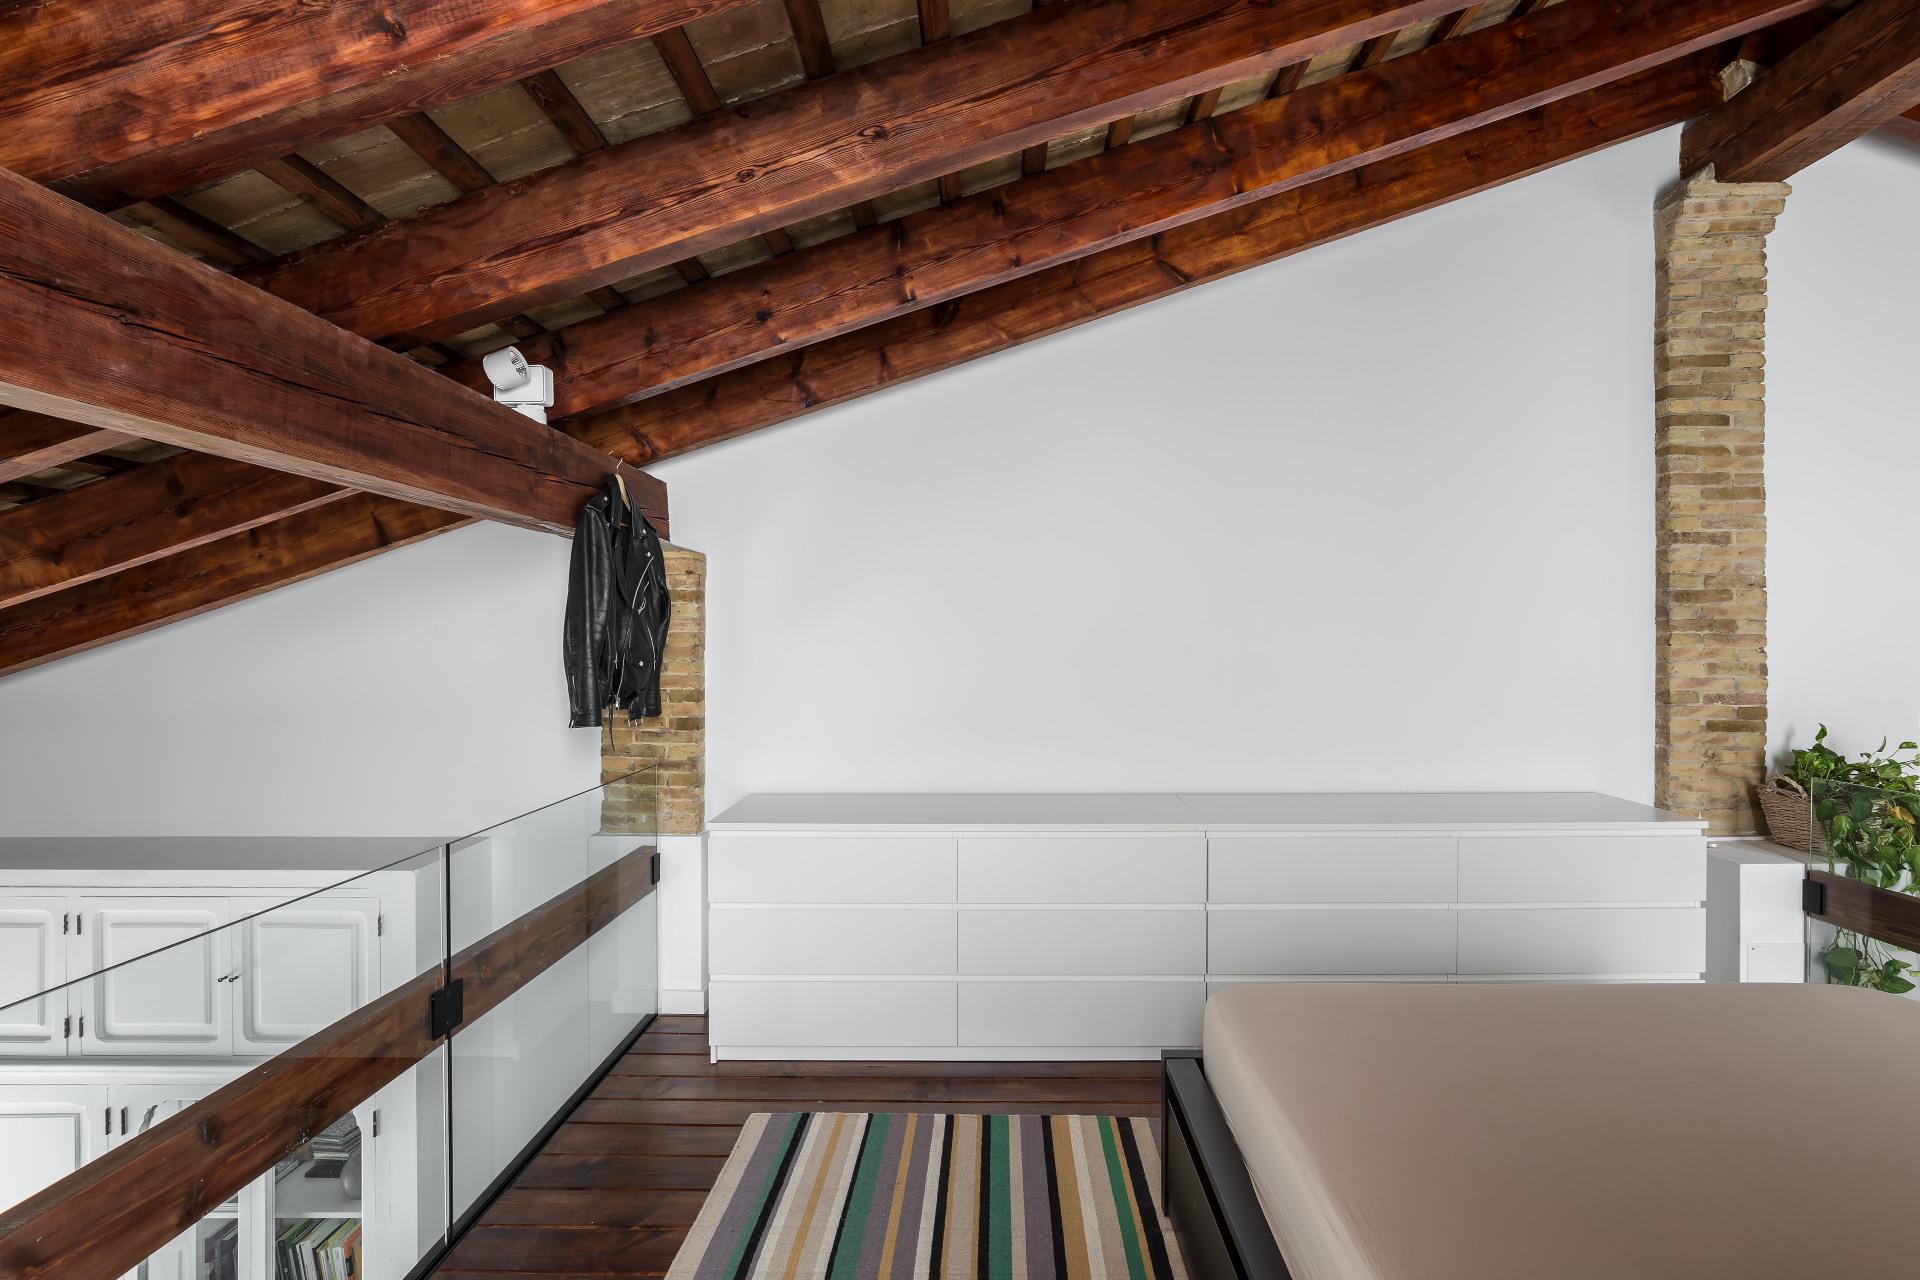 fotografia-arquitectura-valencia-german-cabo-ambau-cabanyal (21)